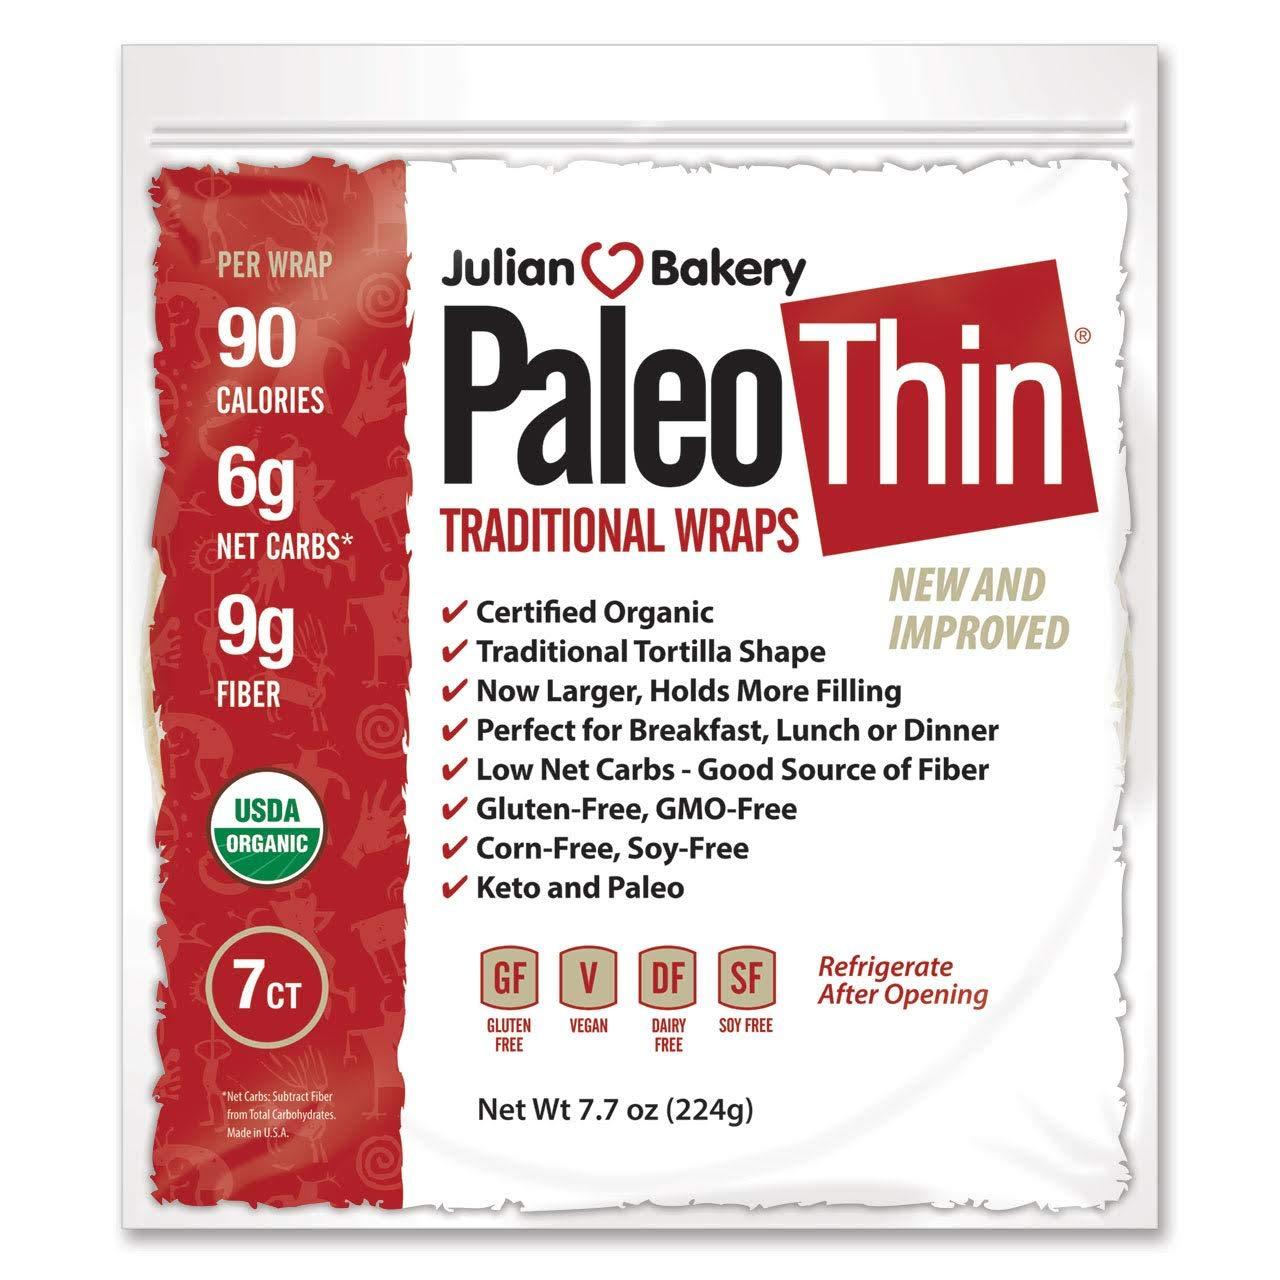 Paleo Thin Wrap USDA Organic (49 Individual Wraps) (Gluten-Free & Low Net Carbs) VeganⓋ by Julian Bakery